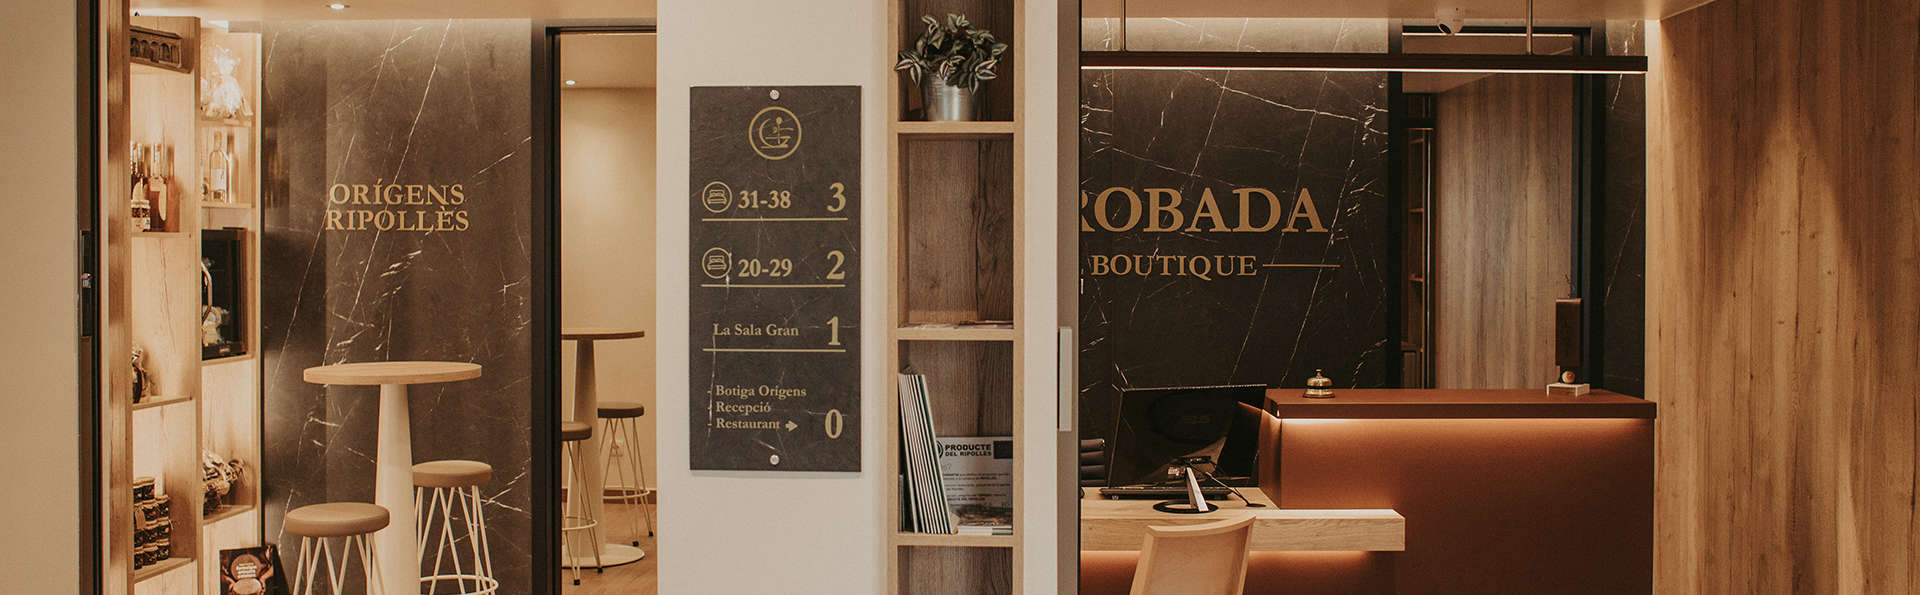 La Trobada Hotel Boutique - EDIT_la_trobada.jpg